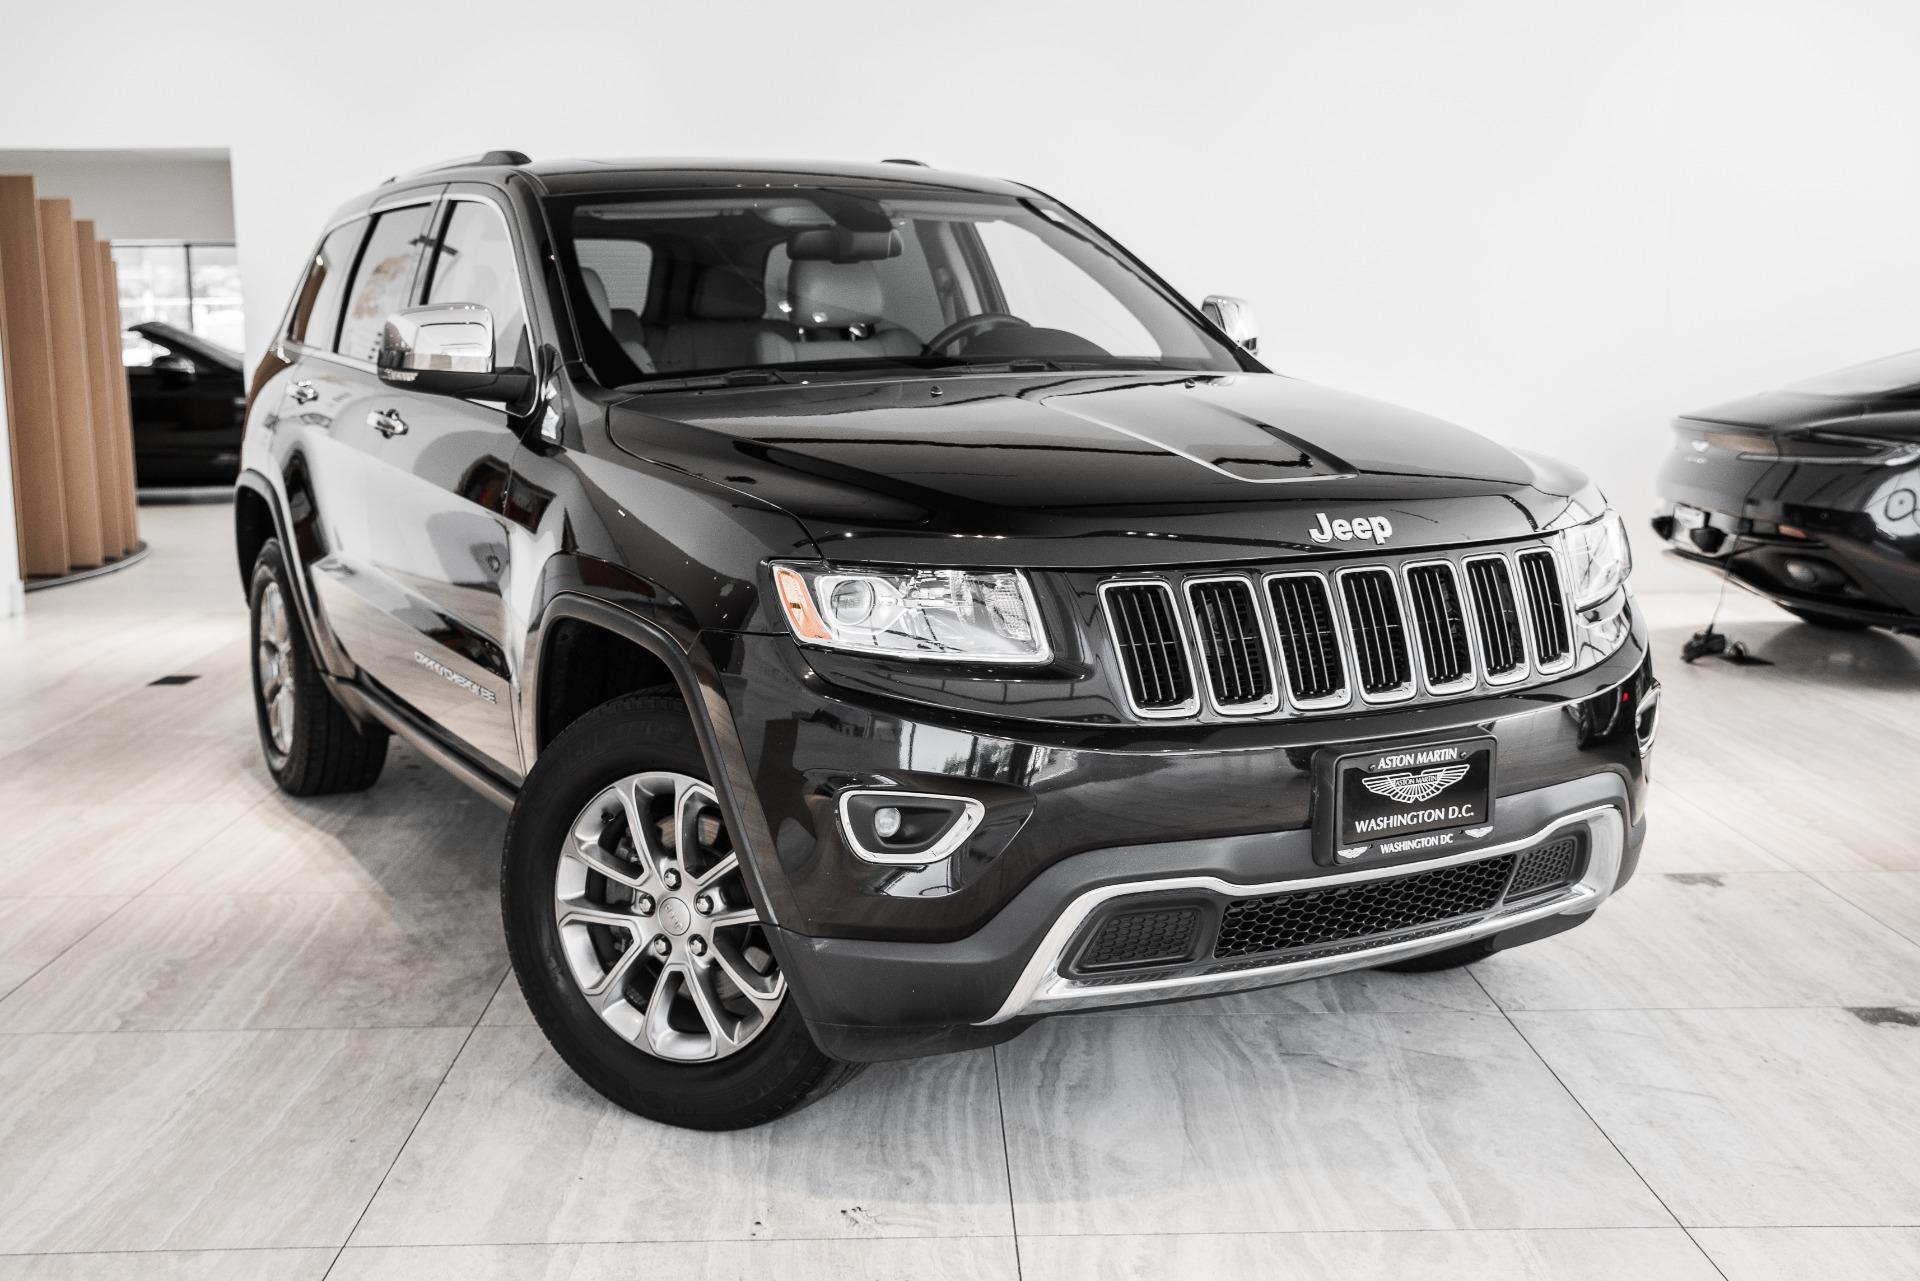 2015 Jeep Grand Cherokee Limited Stock P07324 For Sale Near Vienna Va Va Jeep Dealer